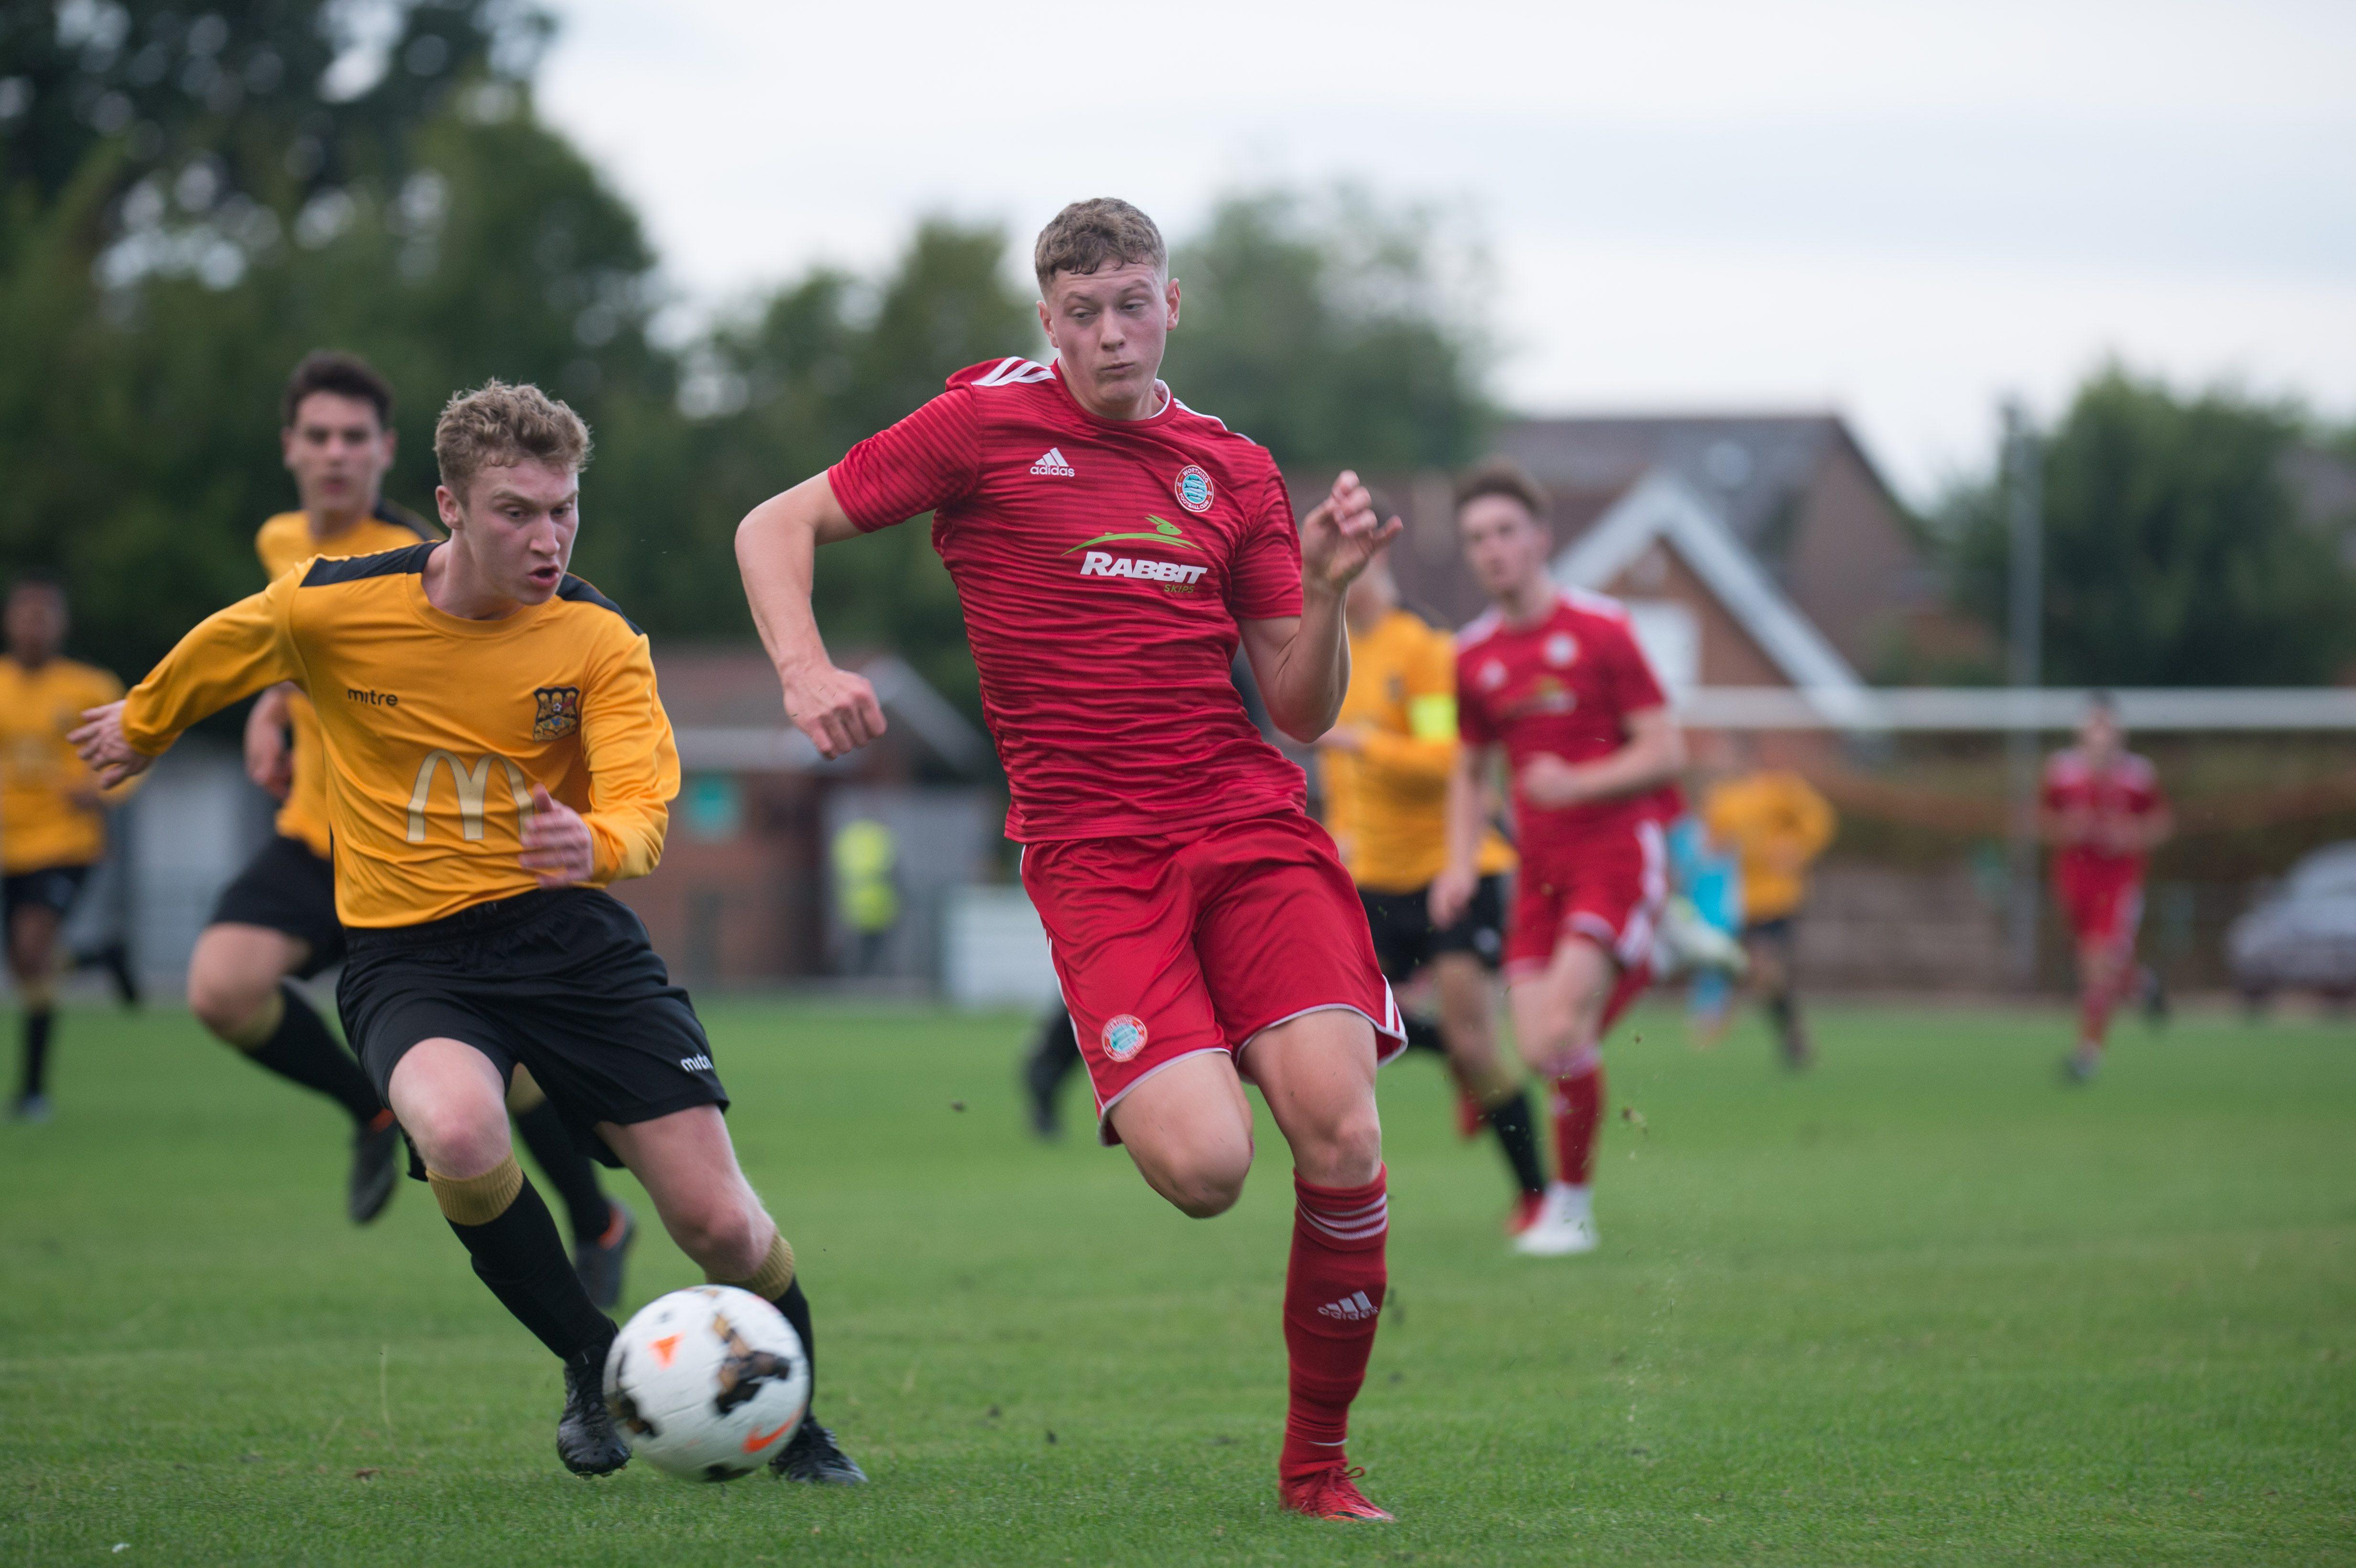 Read the full article - Gallery: Three Bridges U18 [A] – League